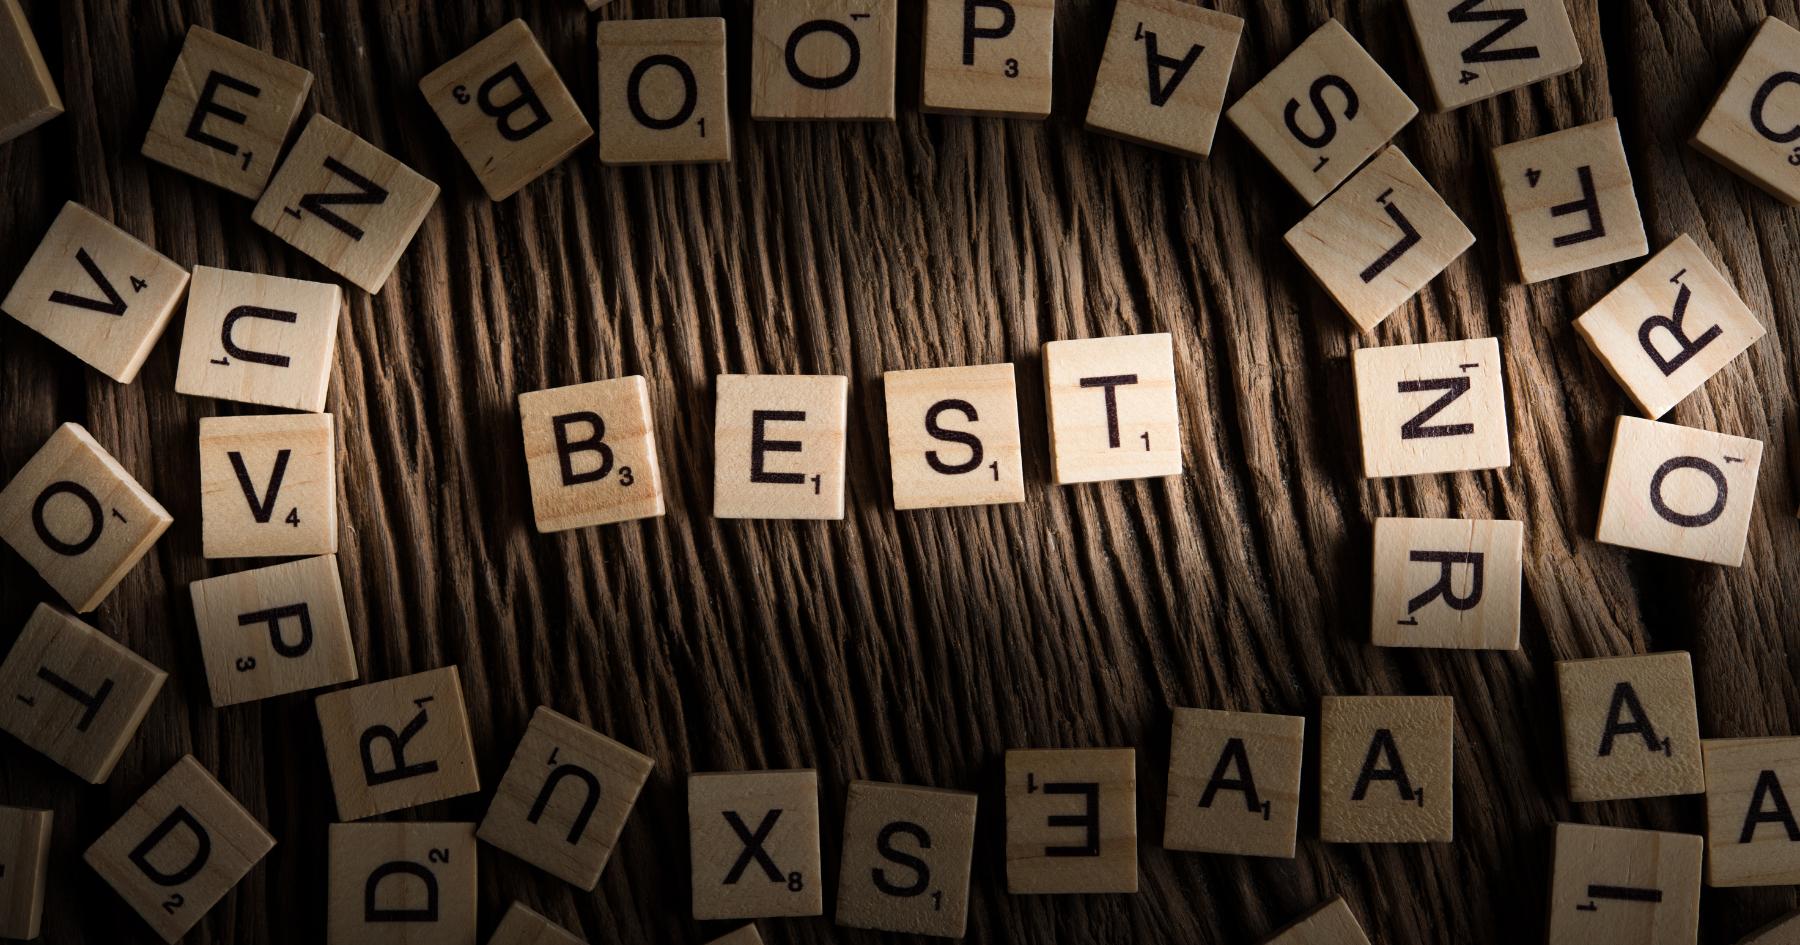 The best websites we've built since lockdown began (all WordPress Designs)